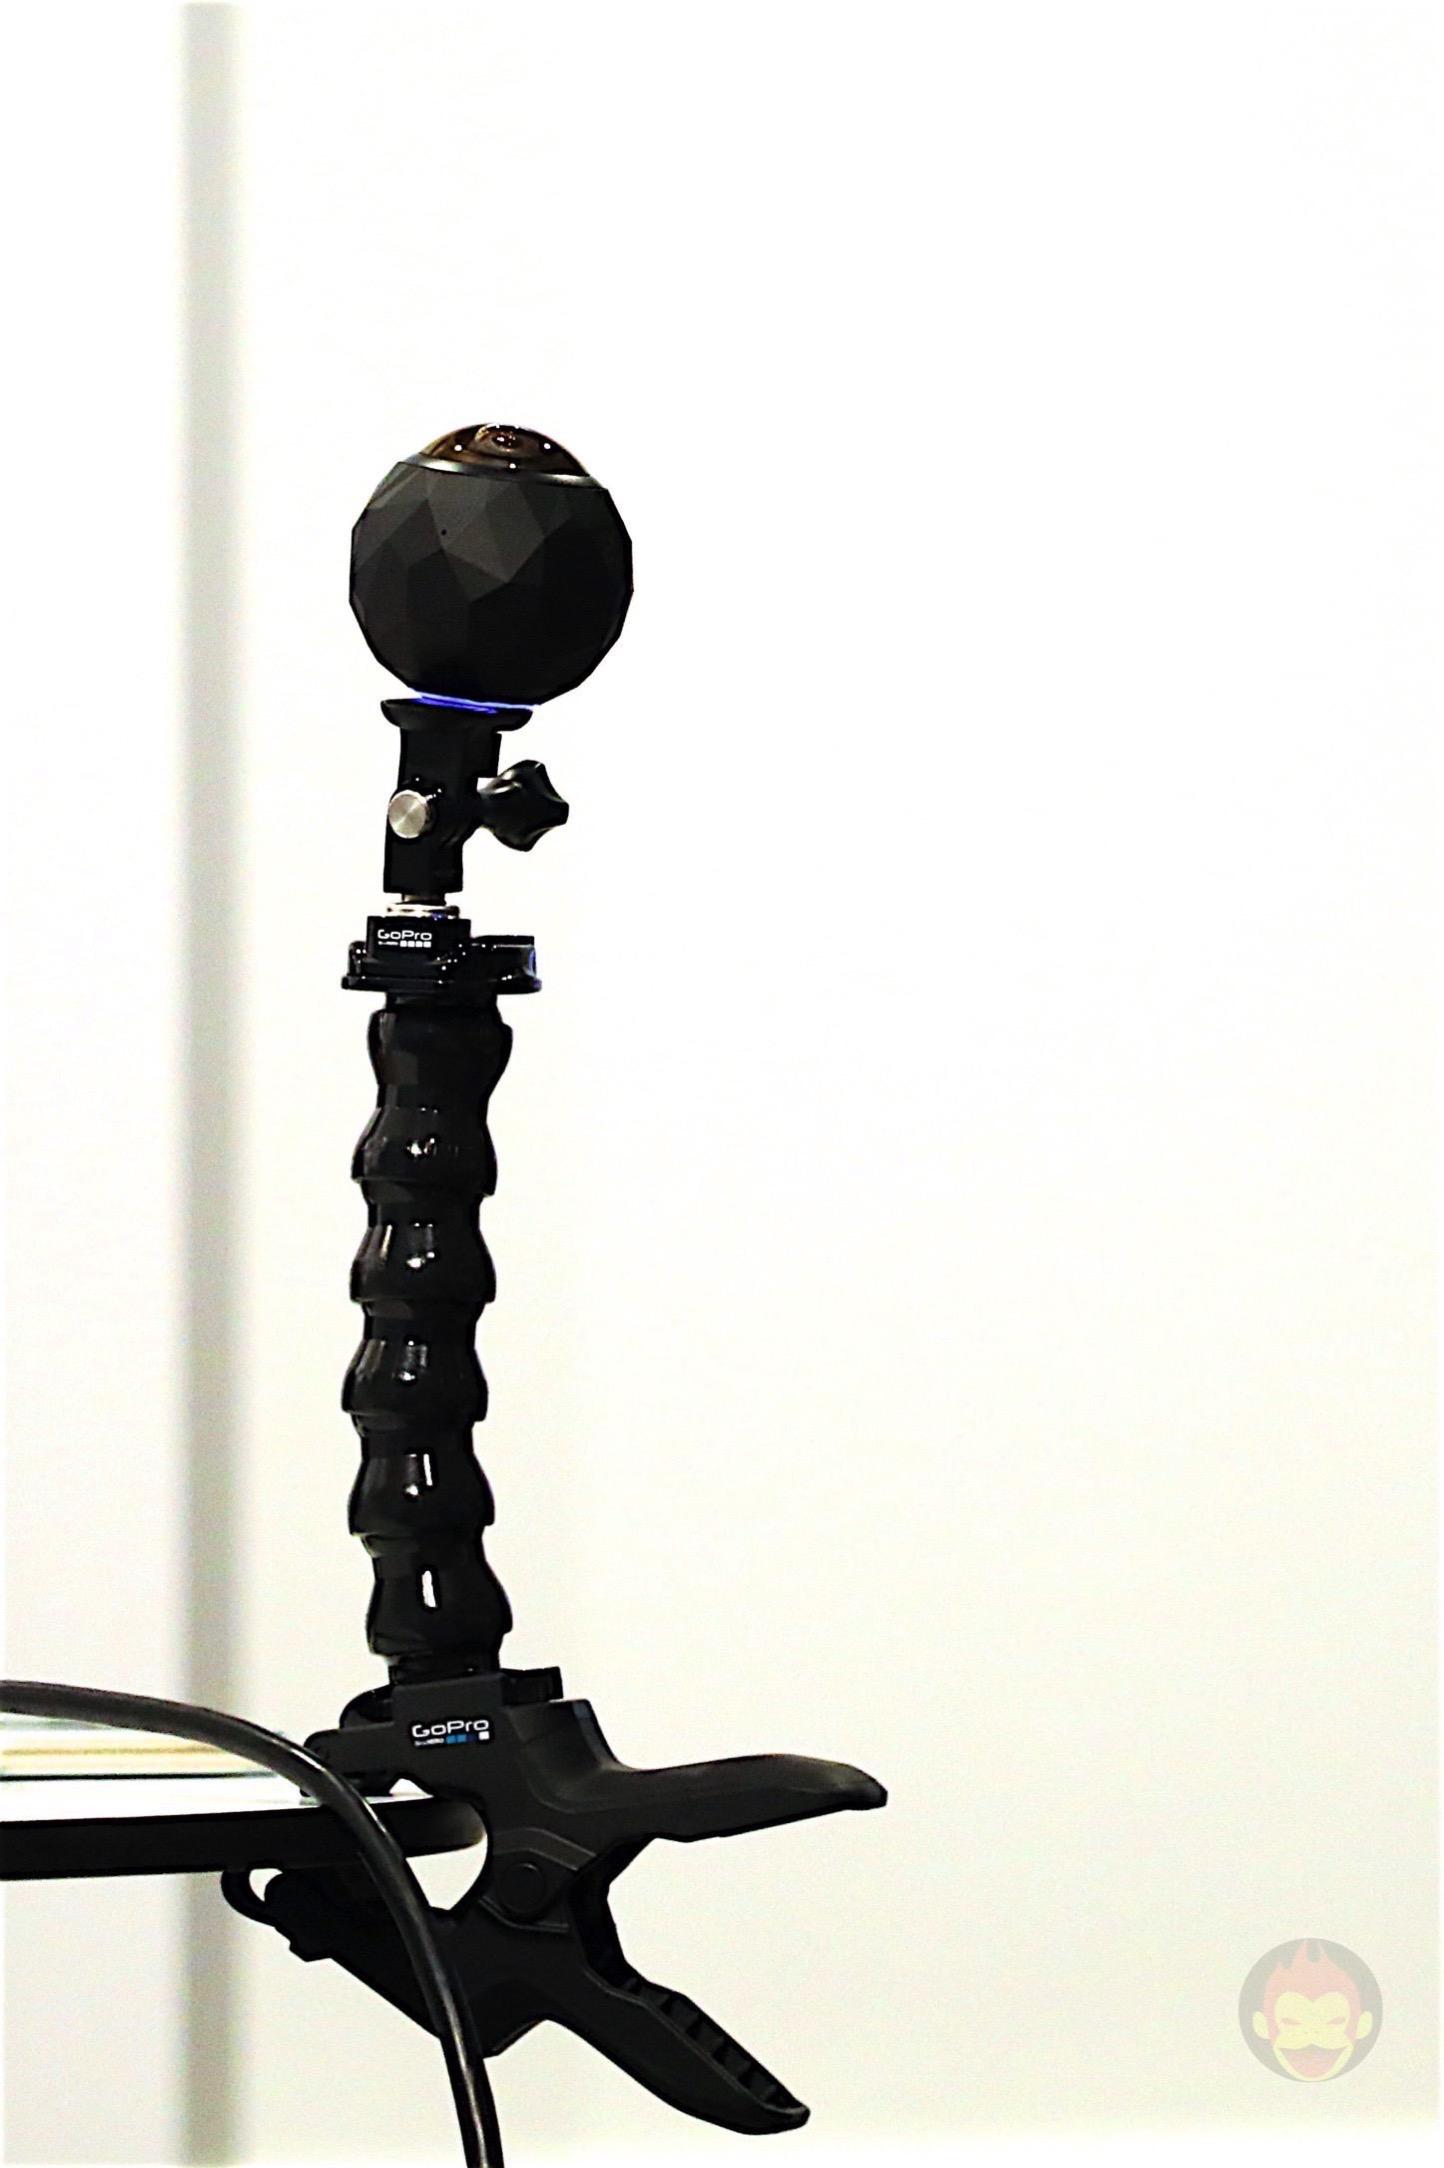 360fly アクションカメラ